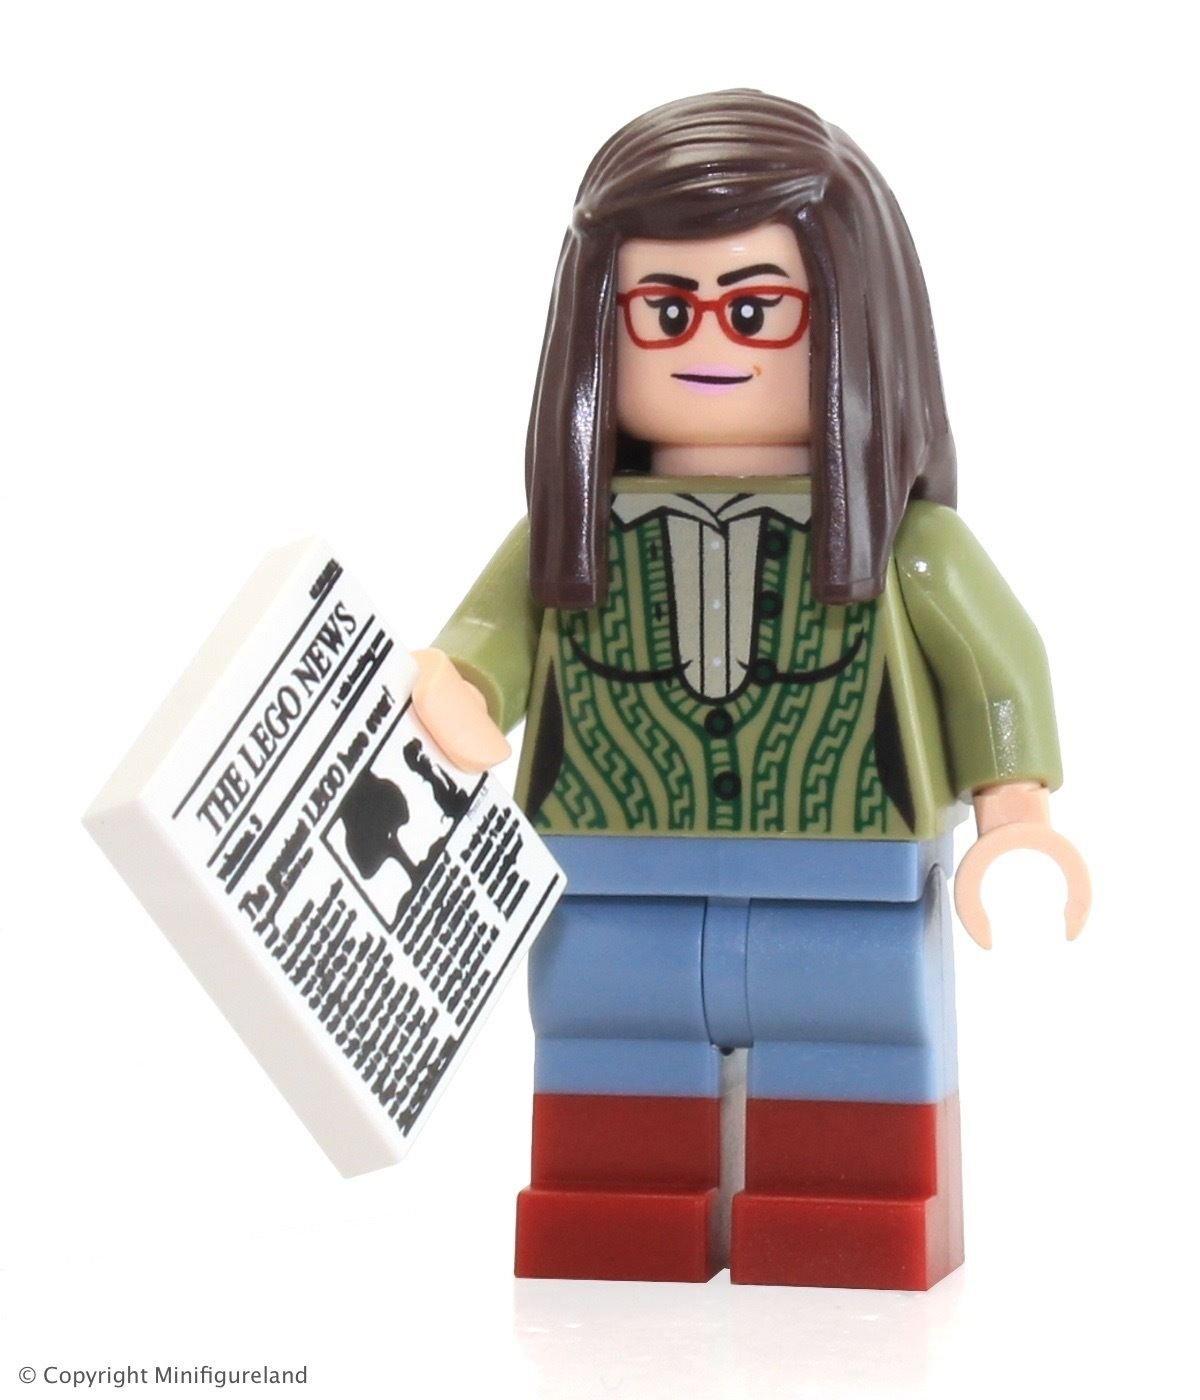 Amazon.com: LEGO Ideas Big Bang Theory Minifigura – Amy ...